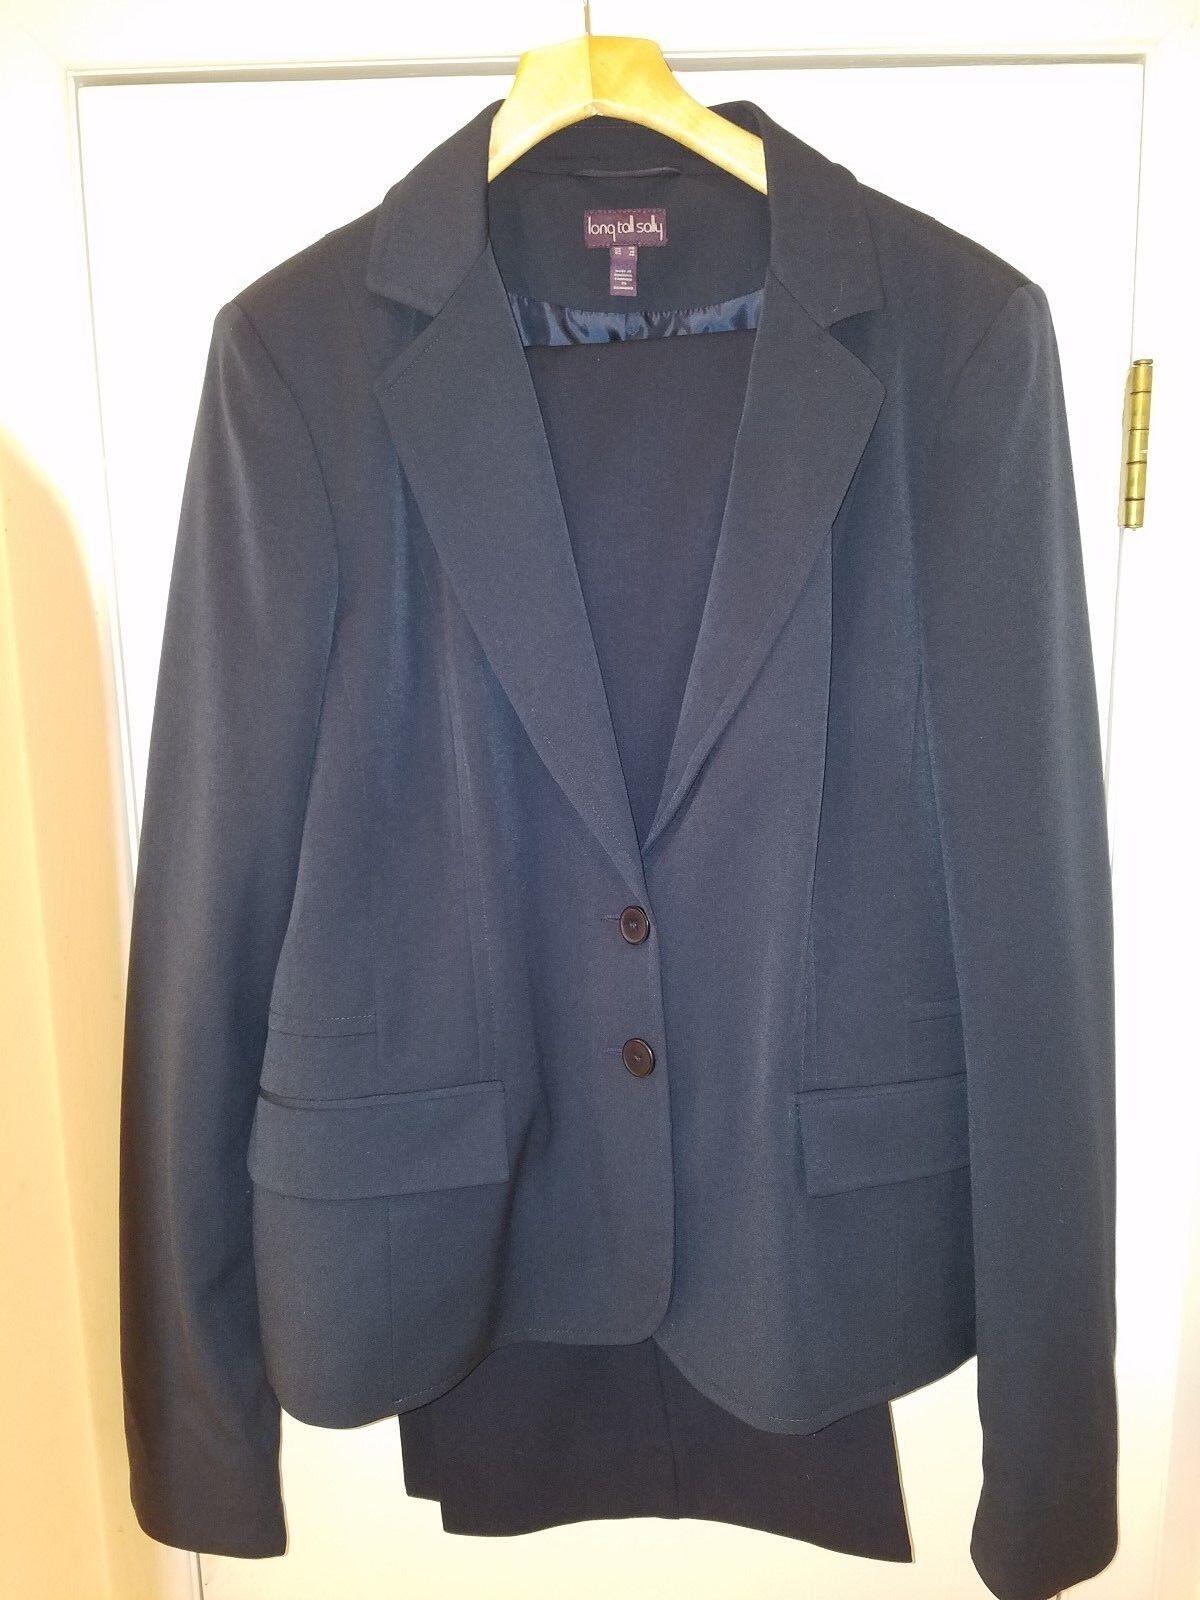 Long Tall Sally Dark Navy Suit US16 18 - 38inch inseam